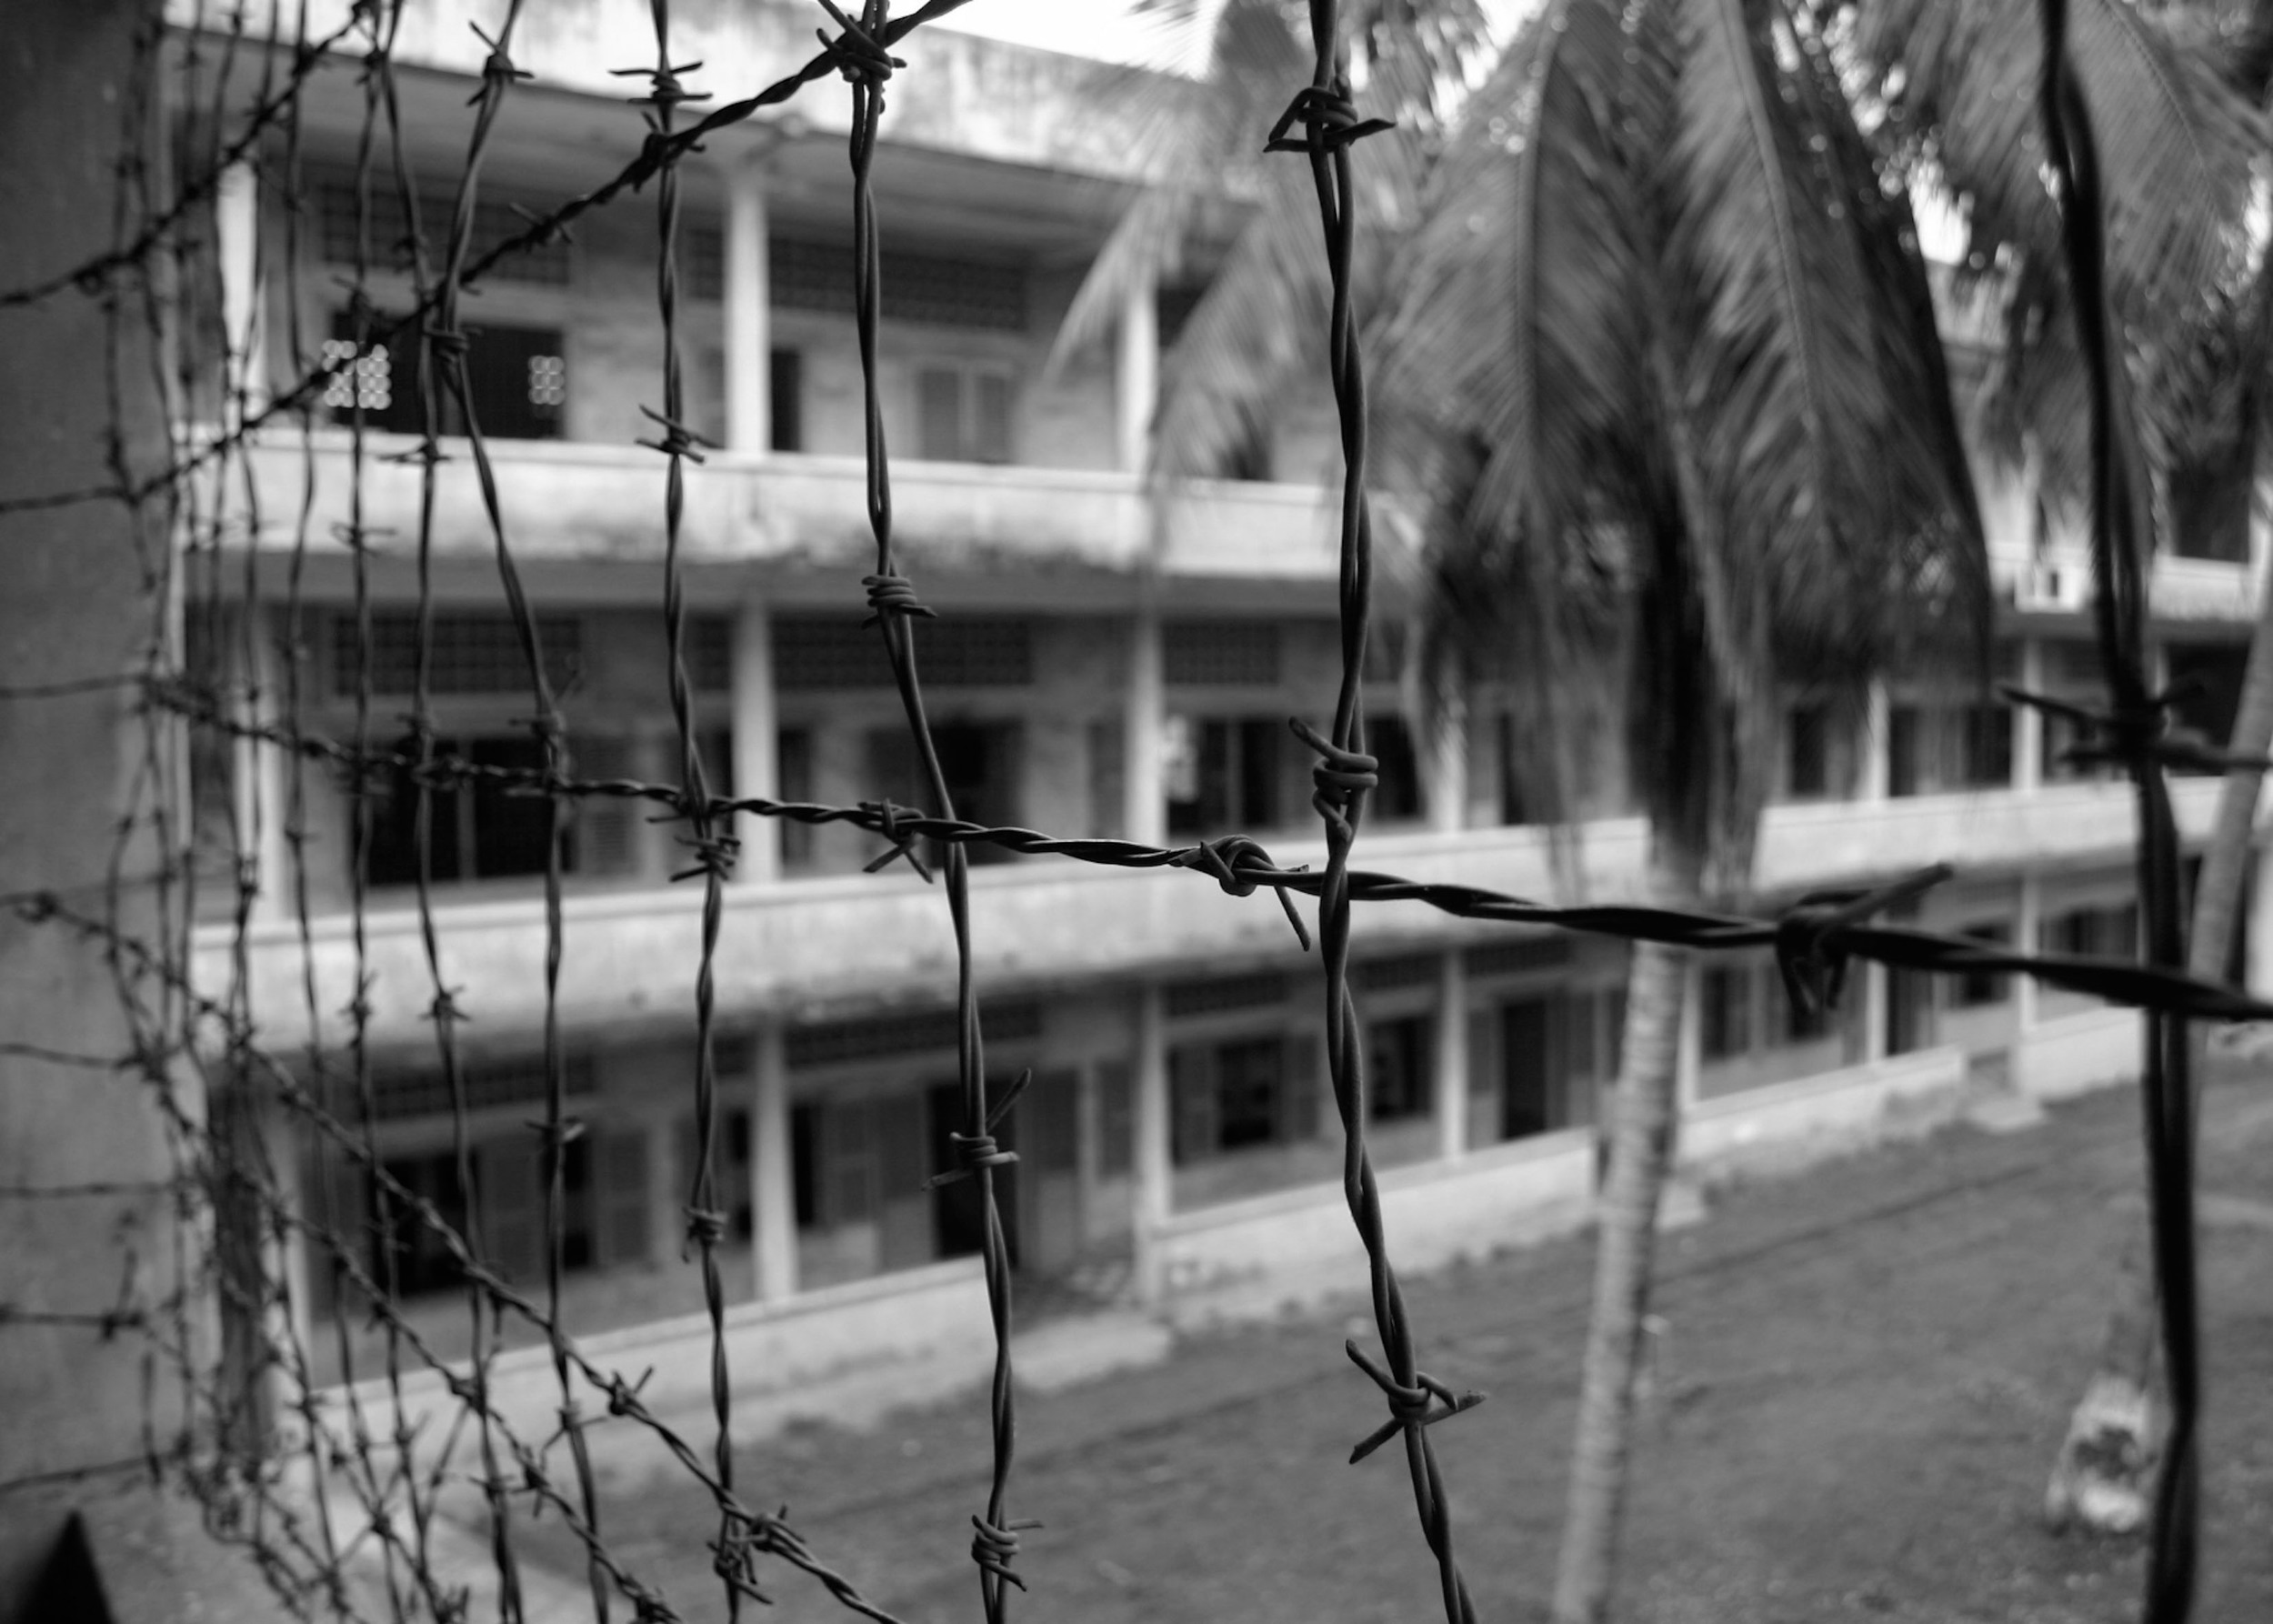 fence tuol sleng.jpg